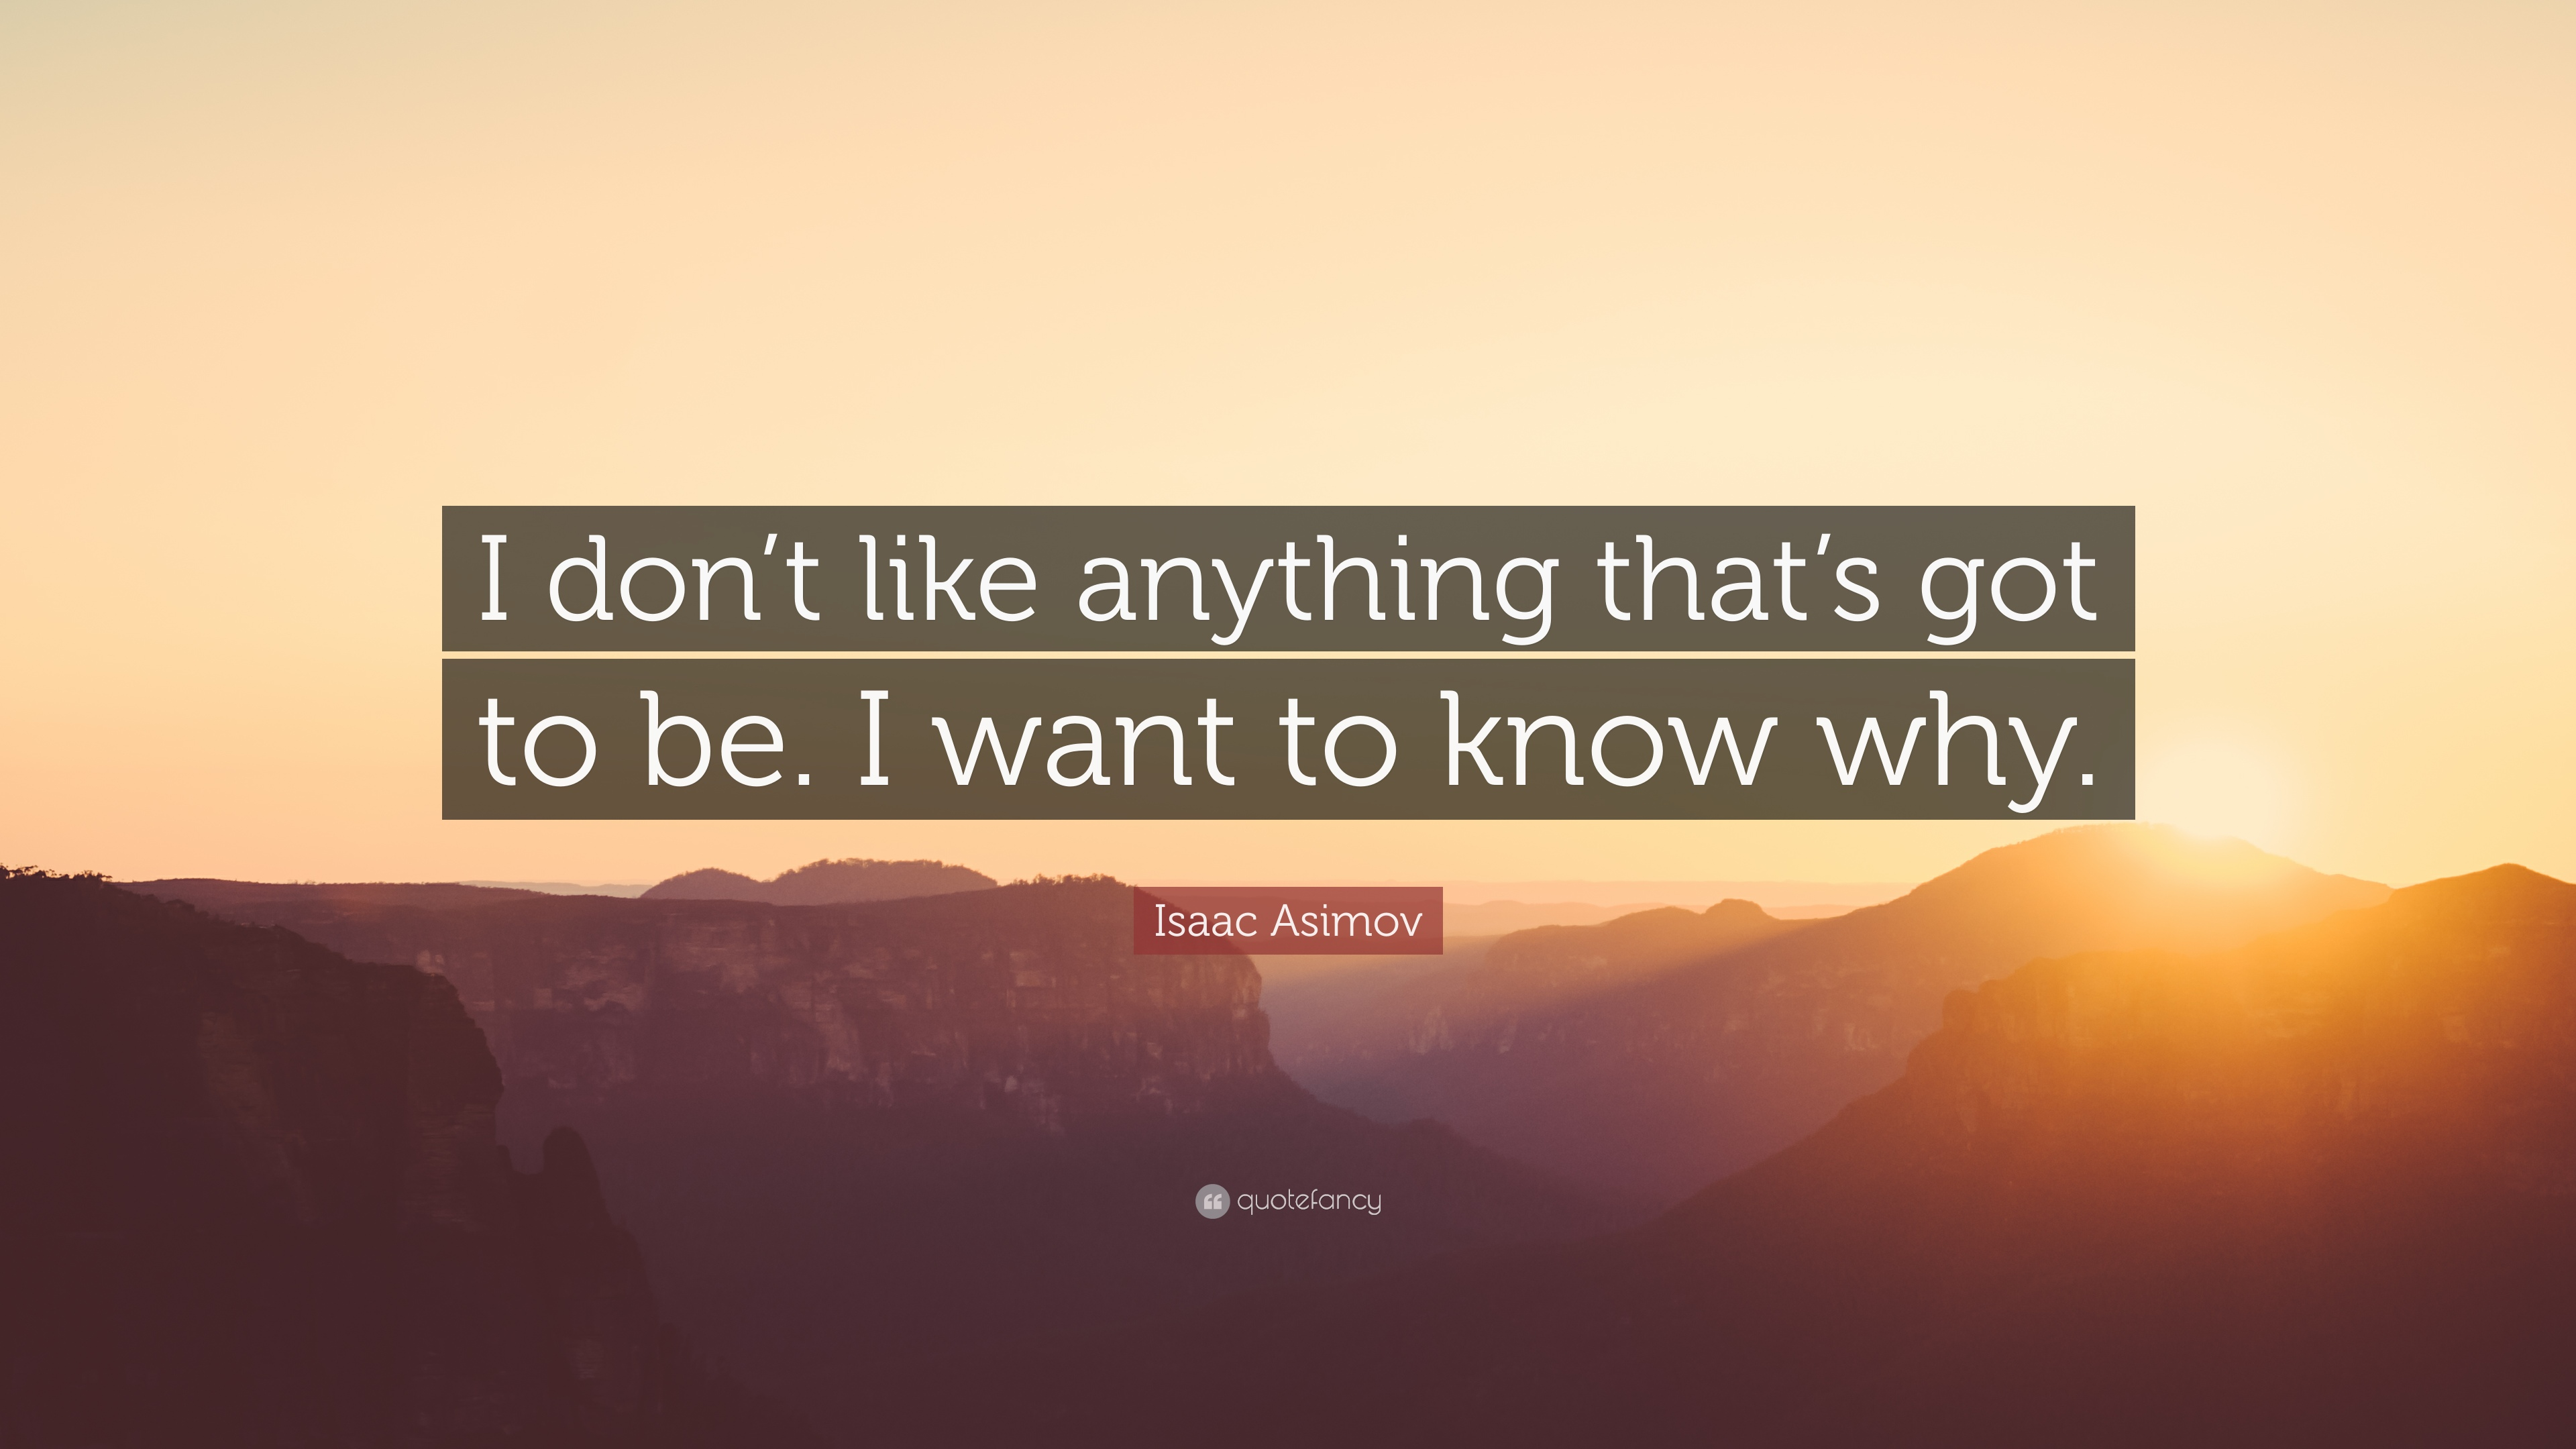 Isaac Asimov Quotes (100 Wallpapers)